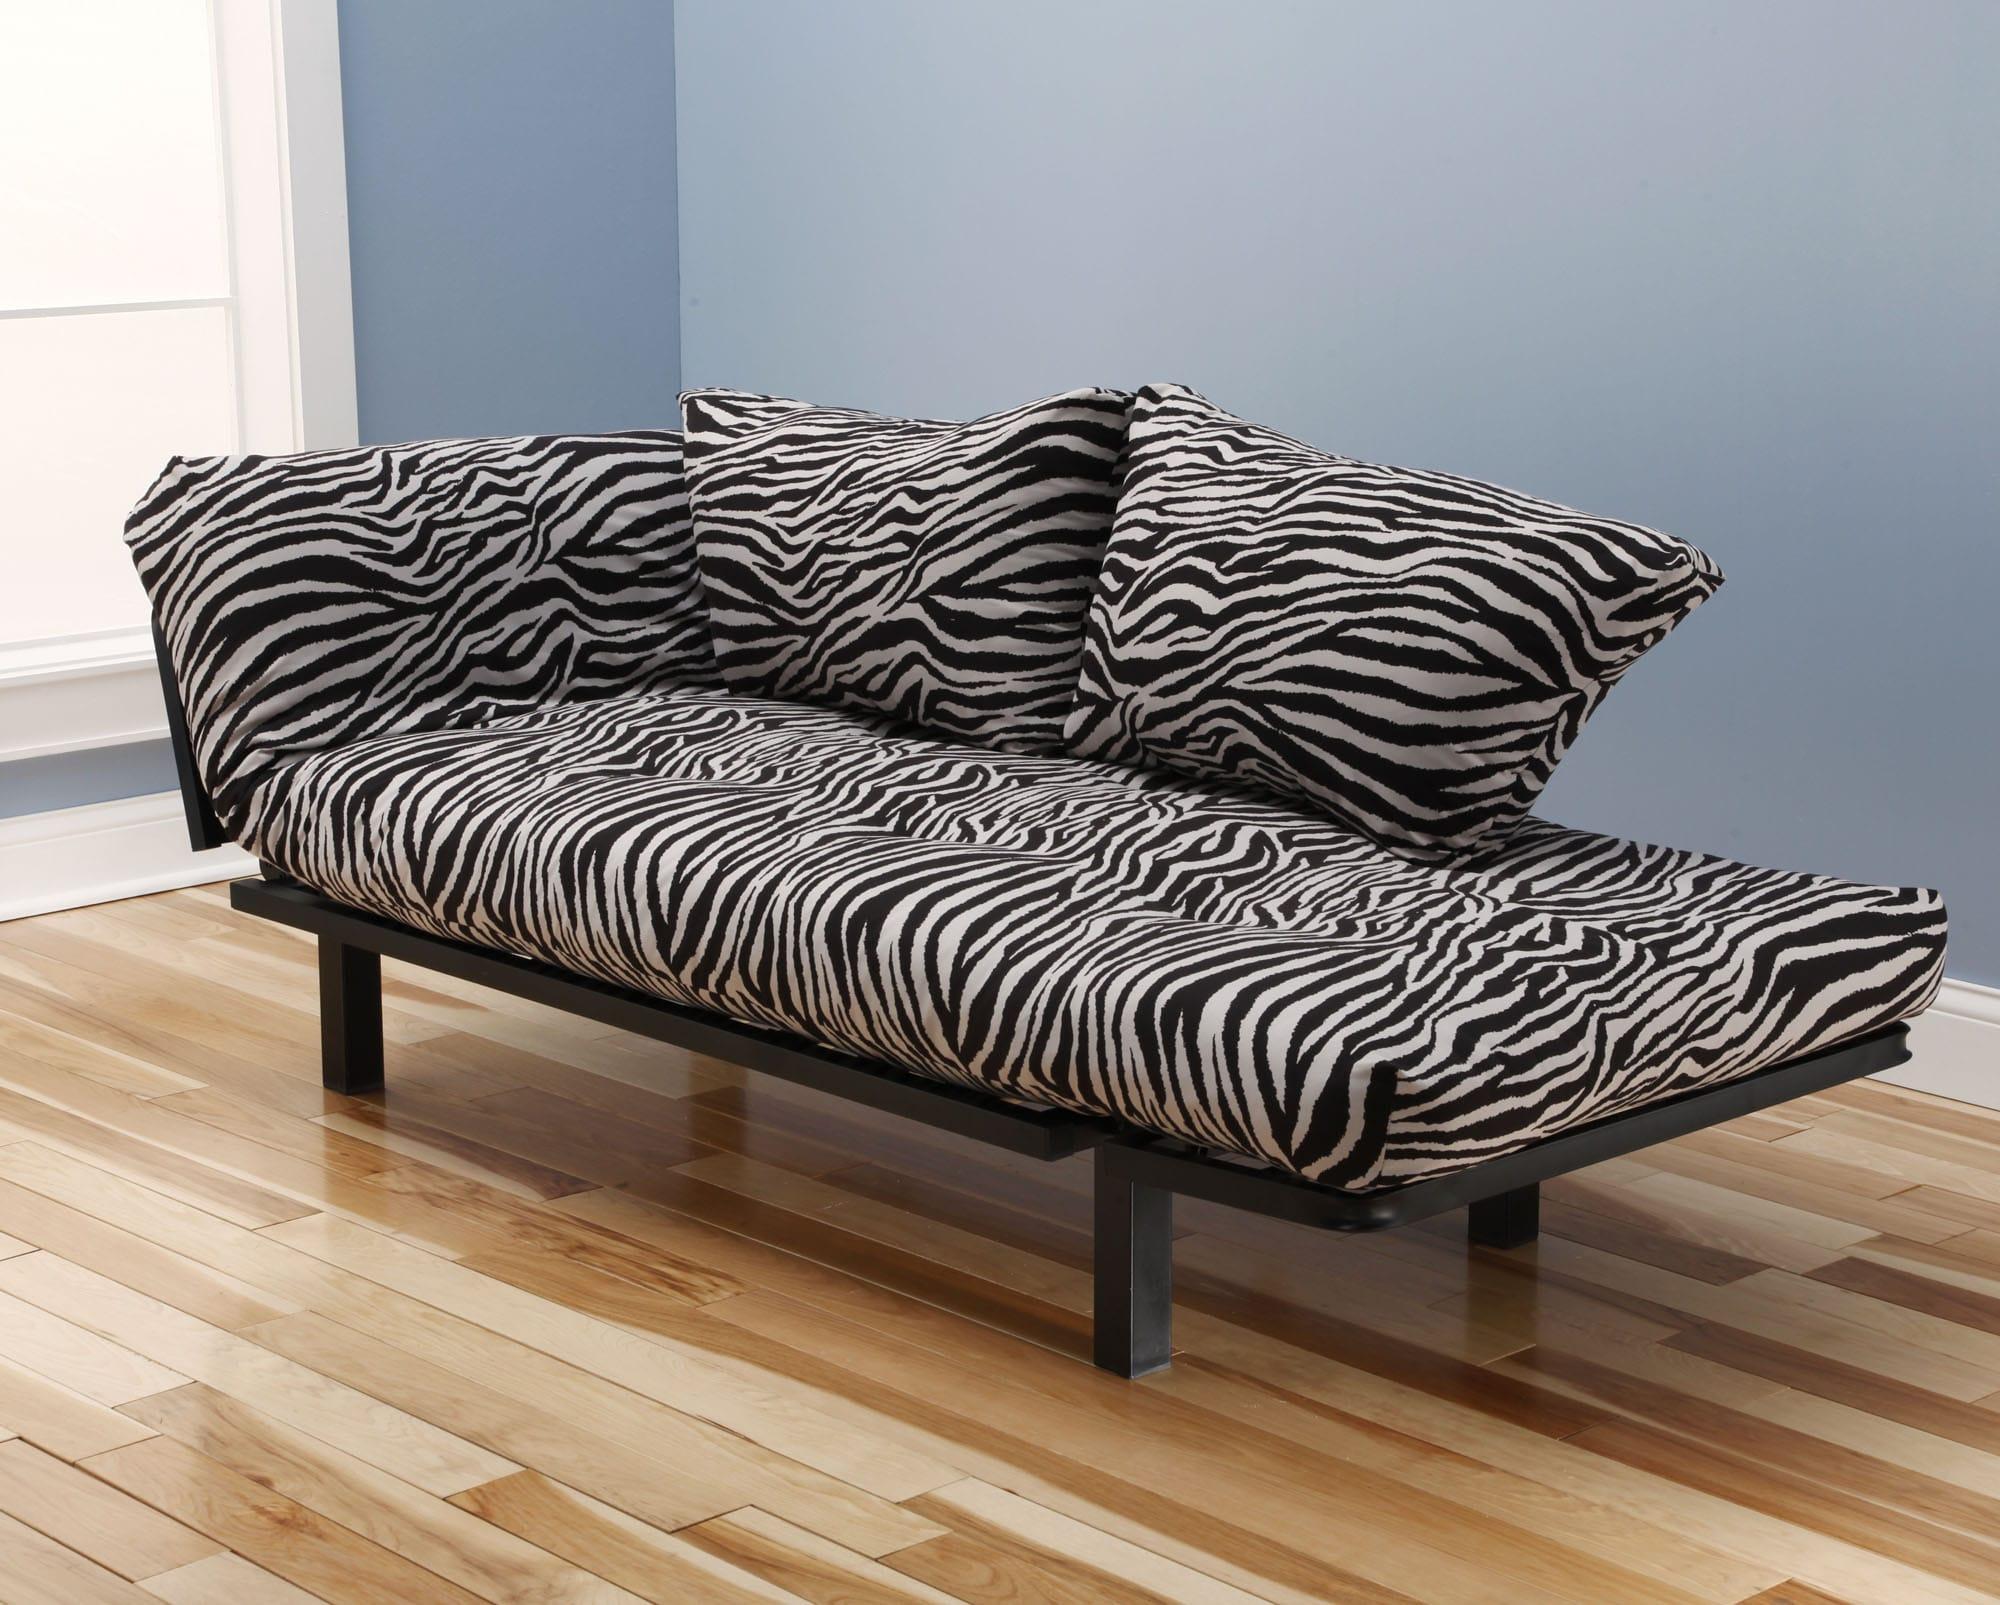 deer print sofa covers victorian chaise lounge zebra futon